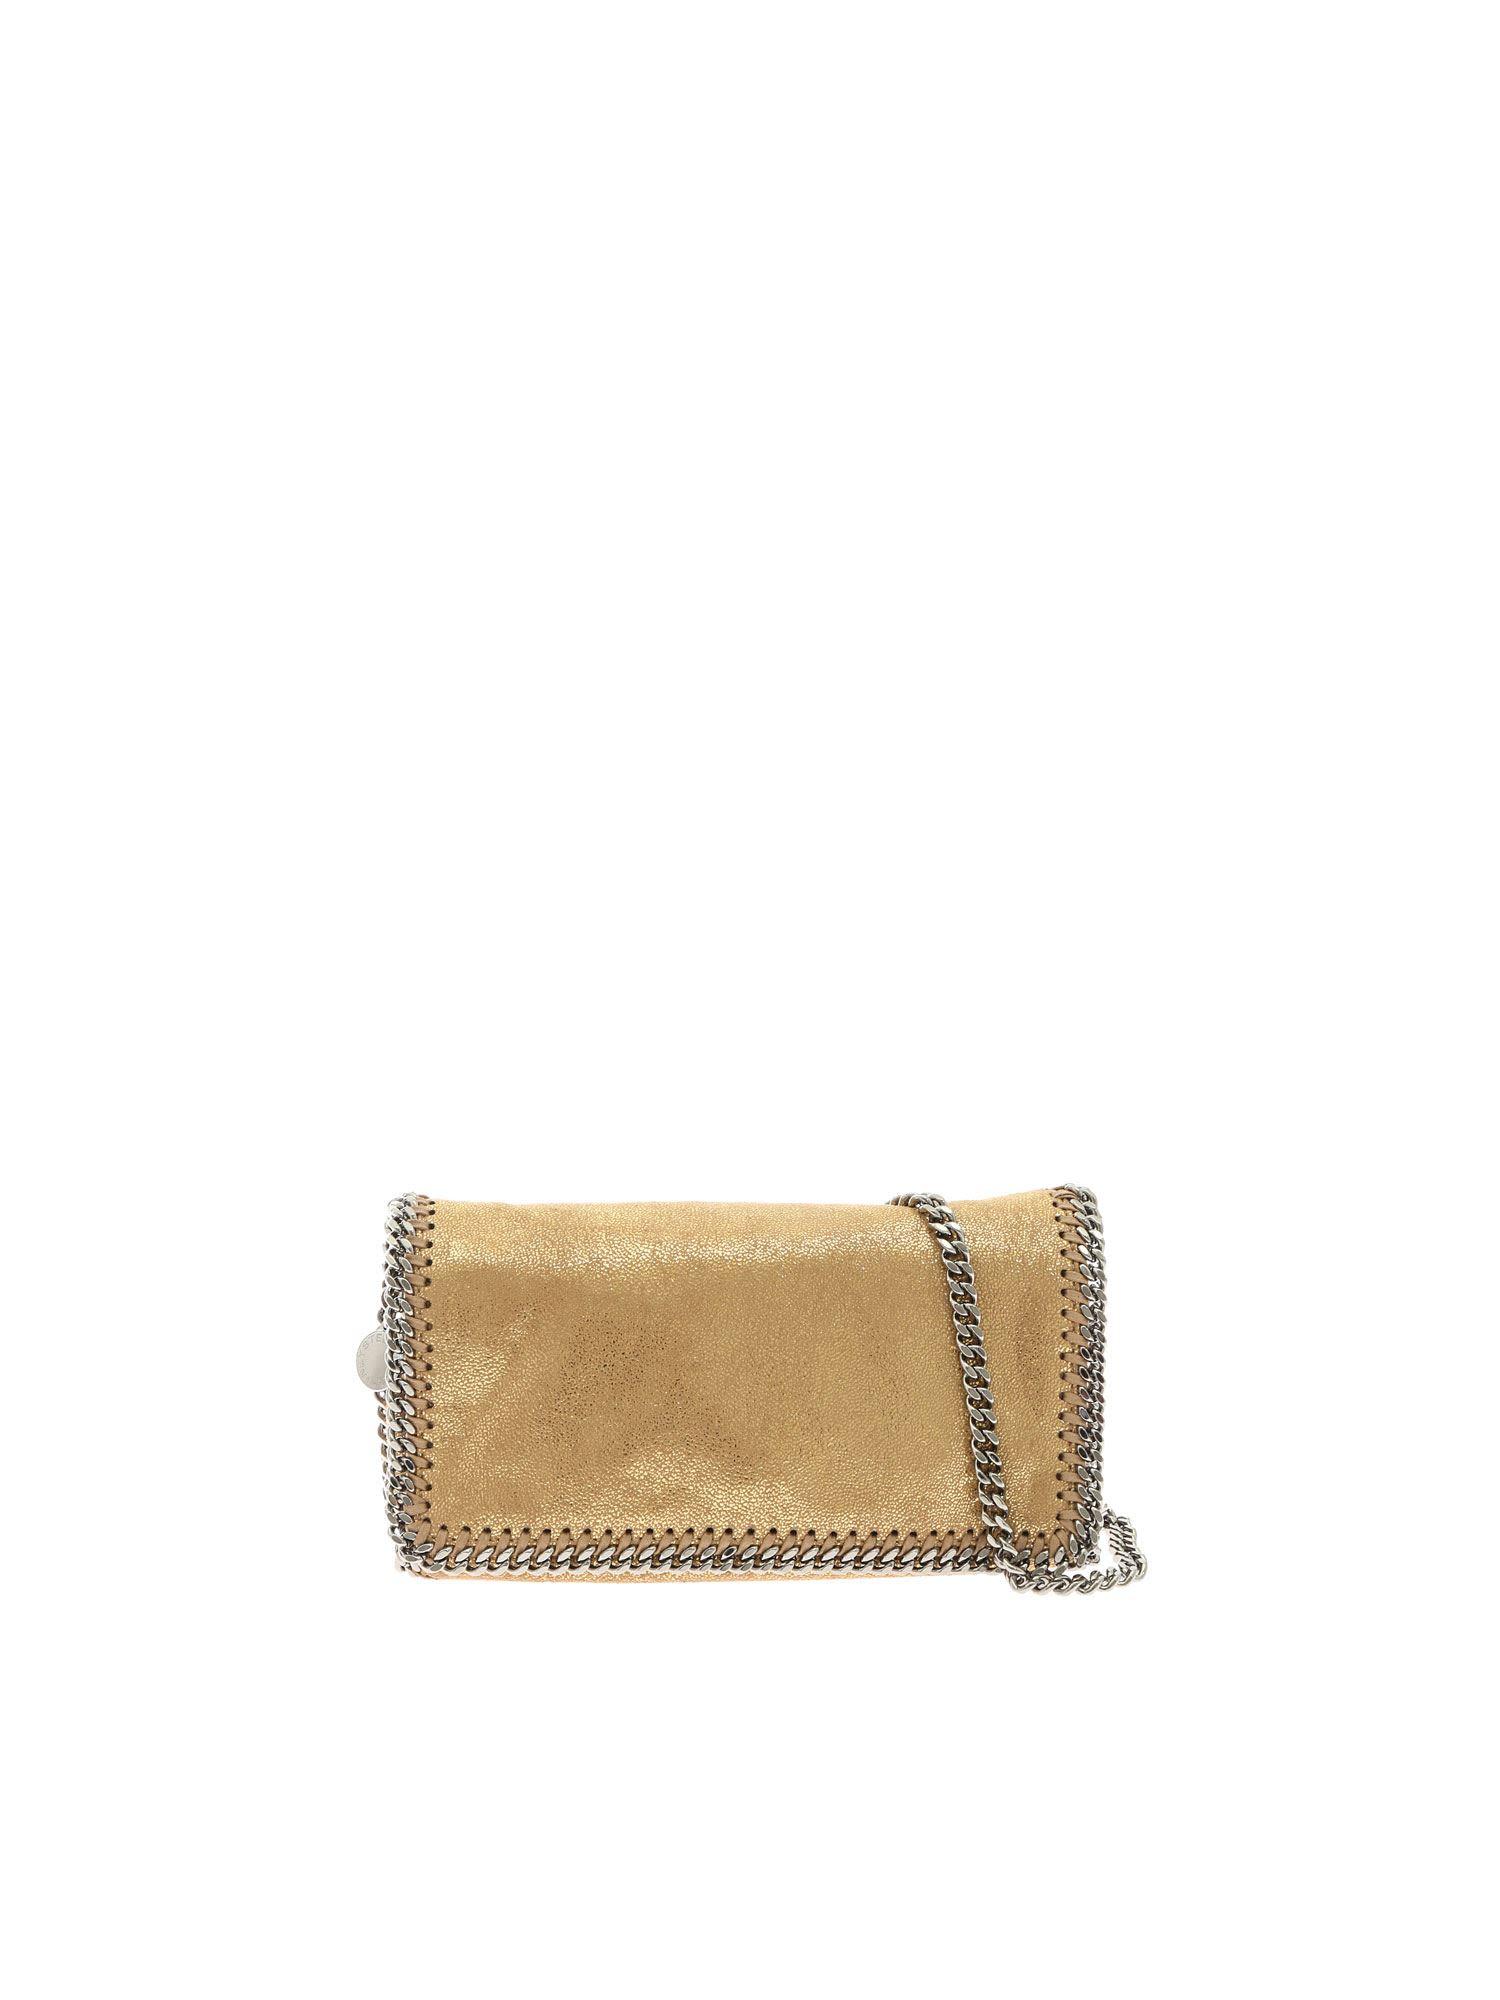 586f9f132070 Stella Mccartney Faux Leather Falabella Clutch In Oro